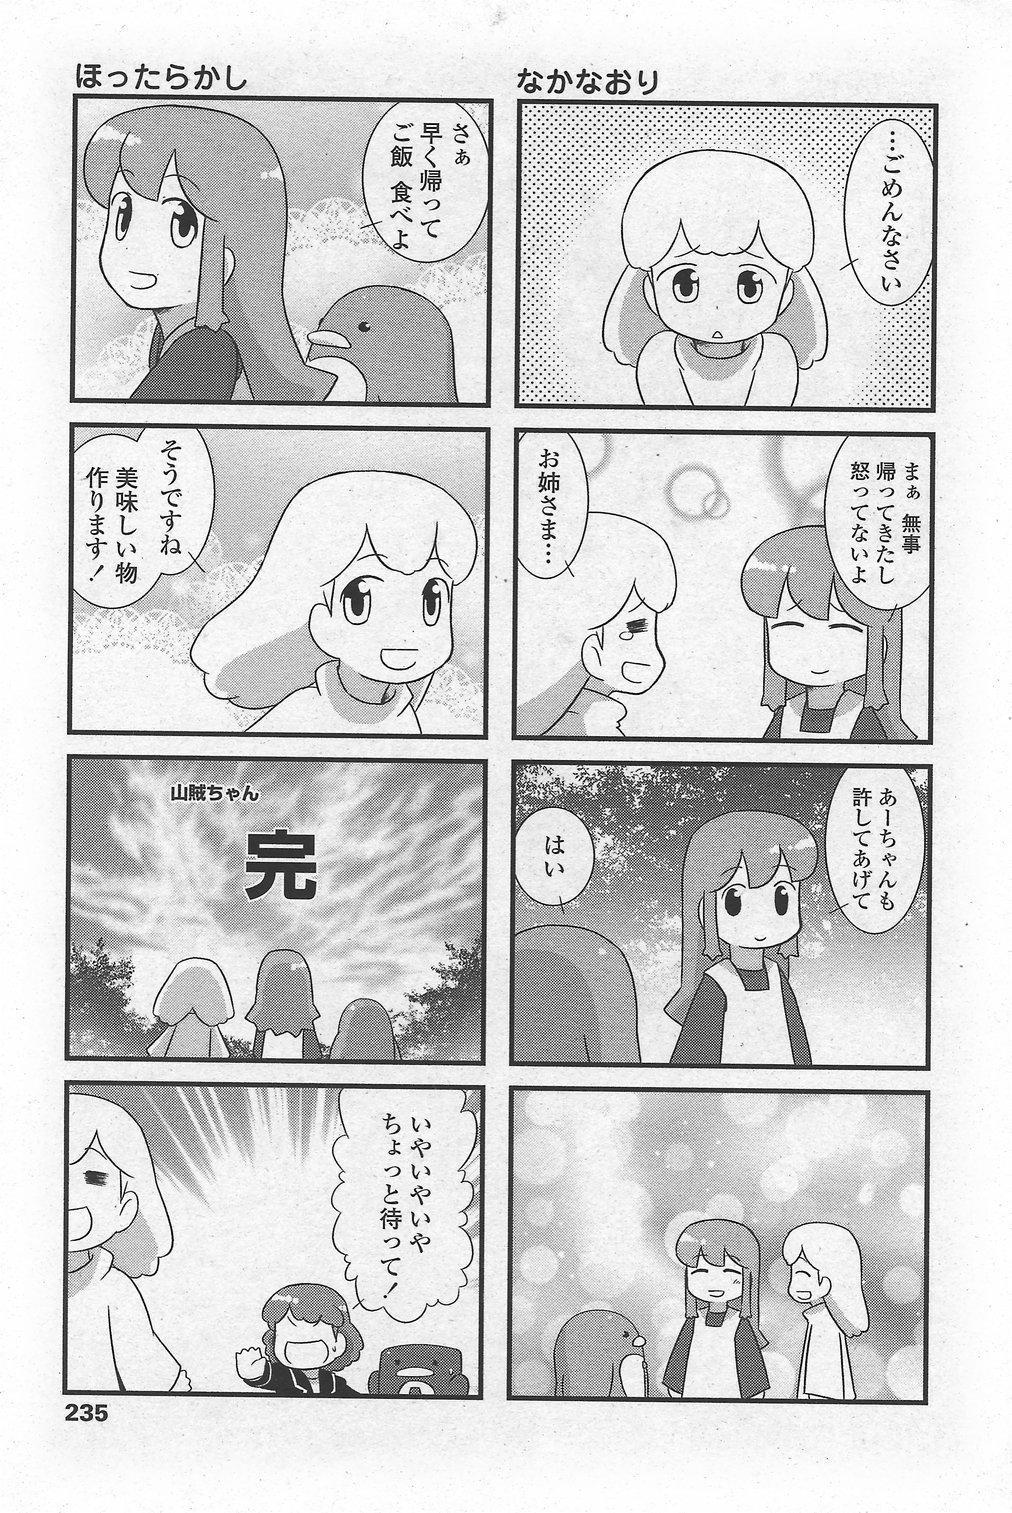 COMIC Penguin Club Sanzokuban 2007-10 Vol. 225 236